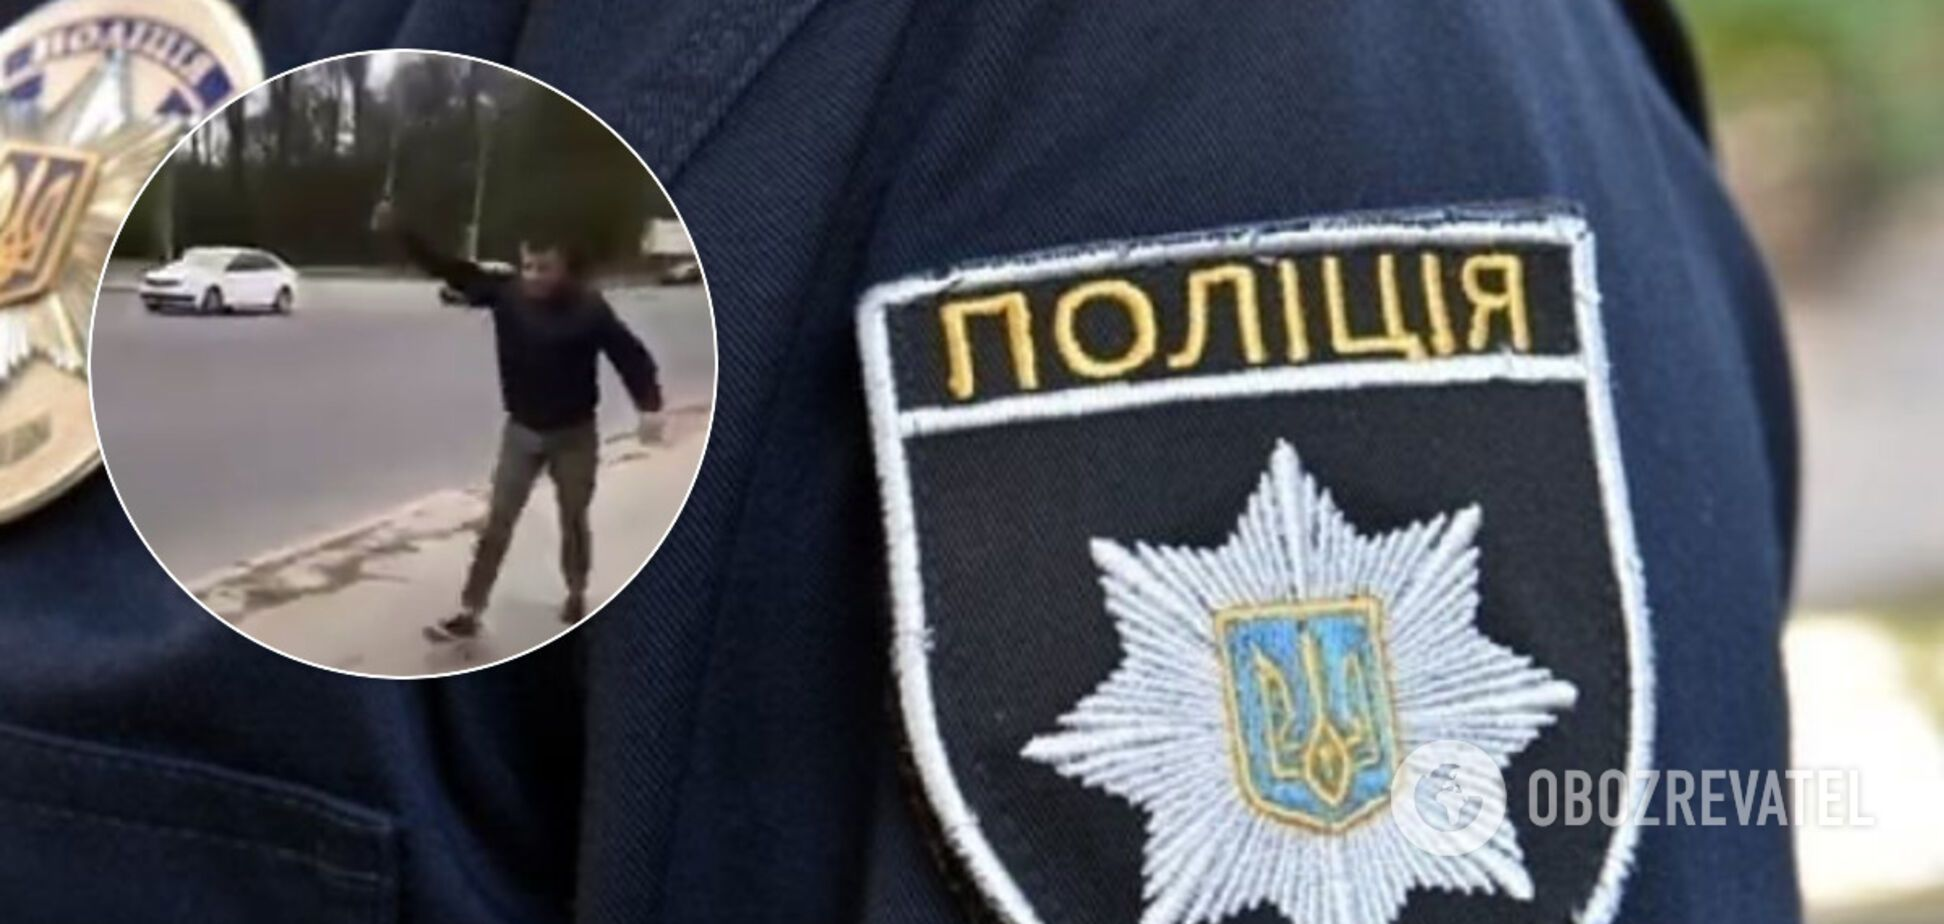 У Кропивницькому хлопець з ножем мало не накинувся на патрульних. Відео 18+